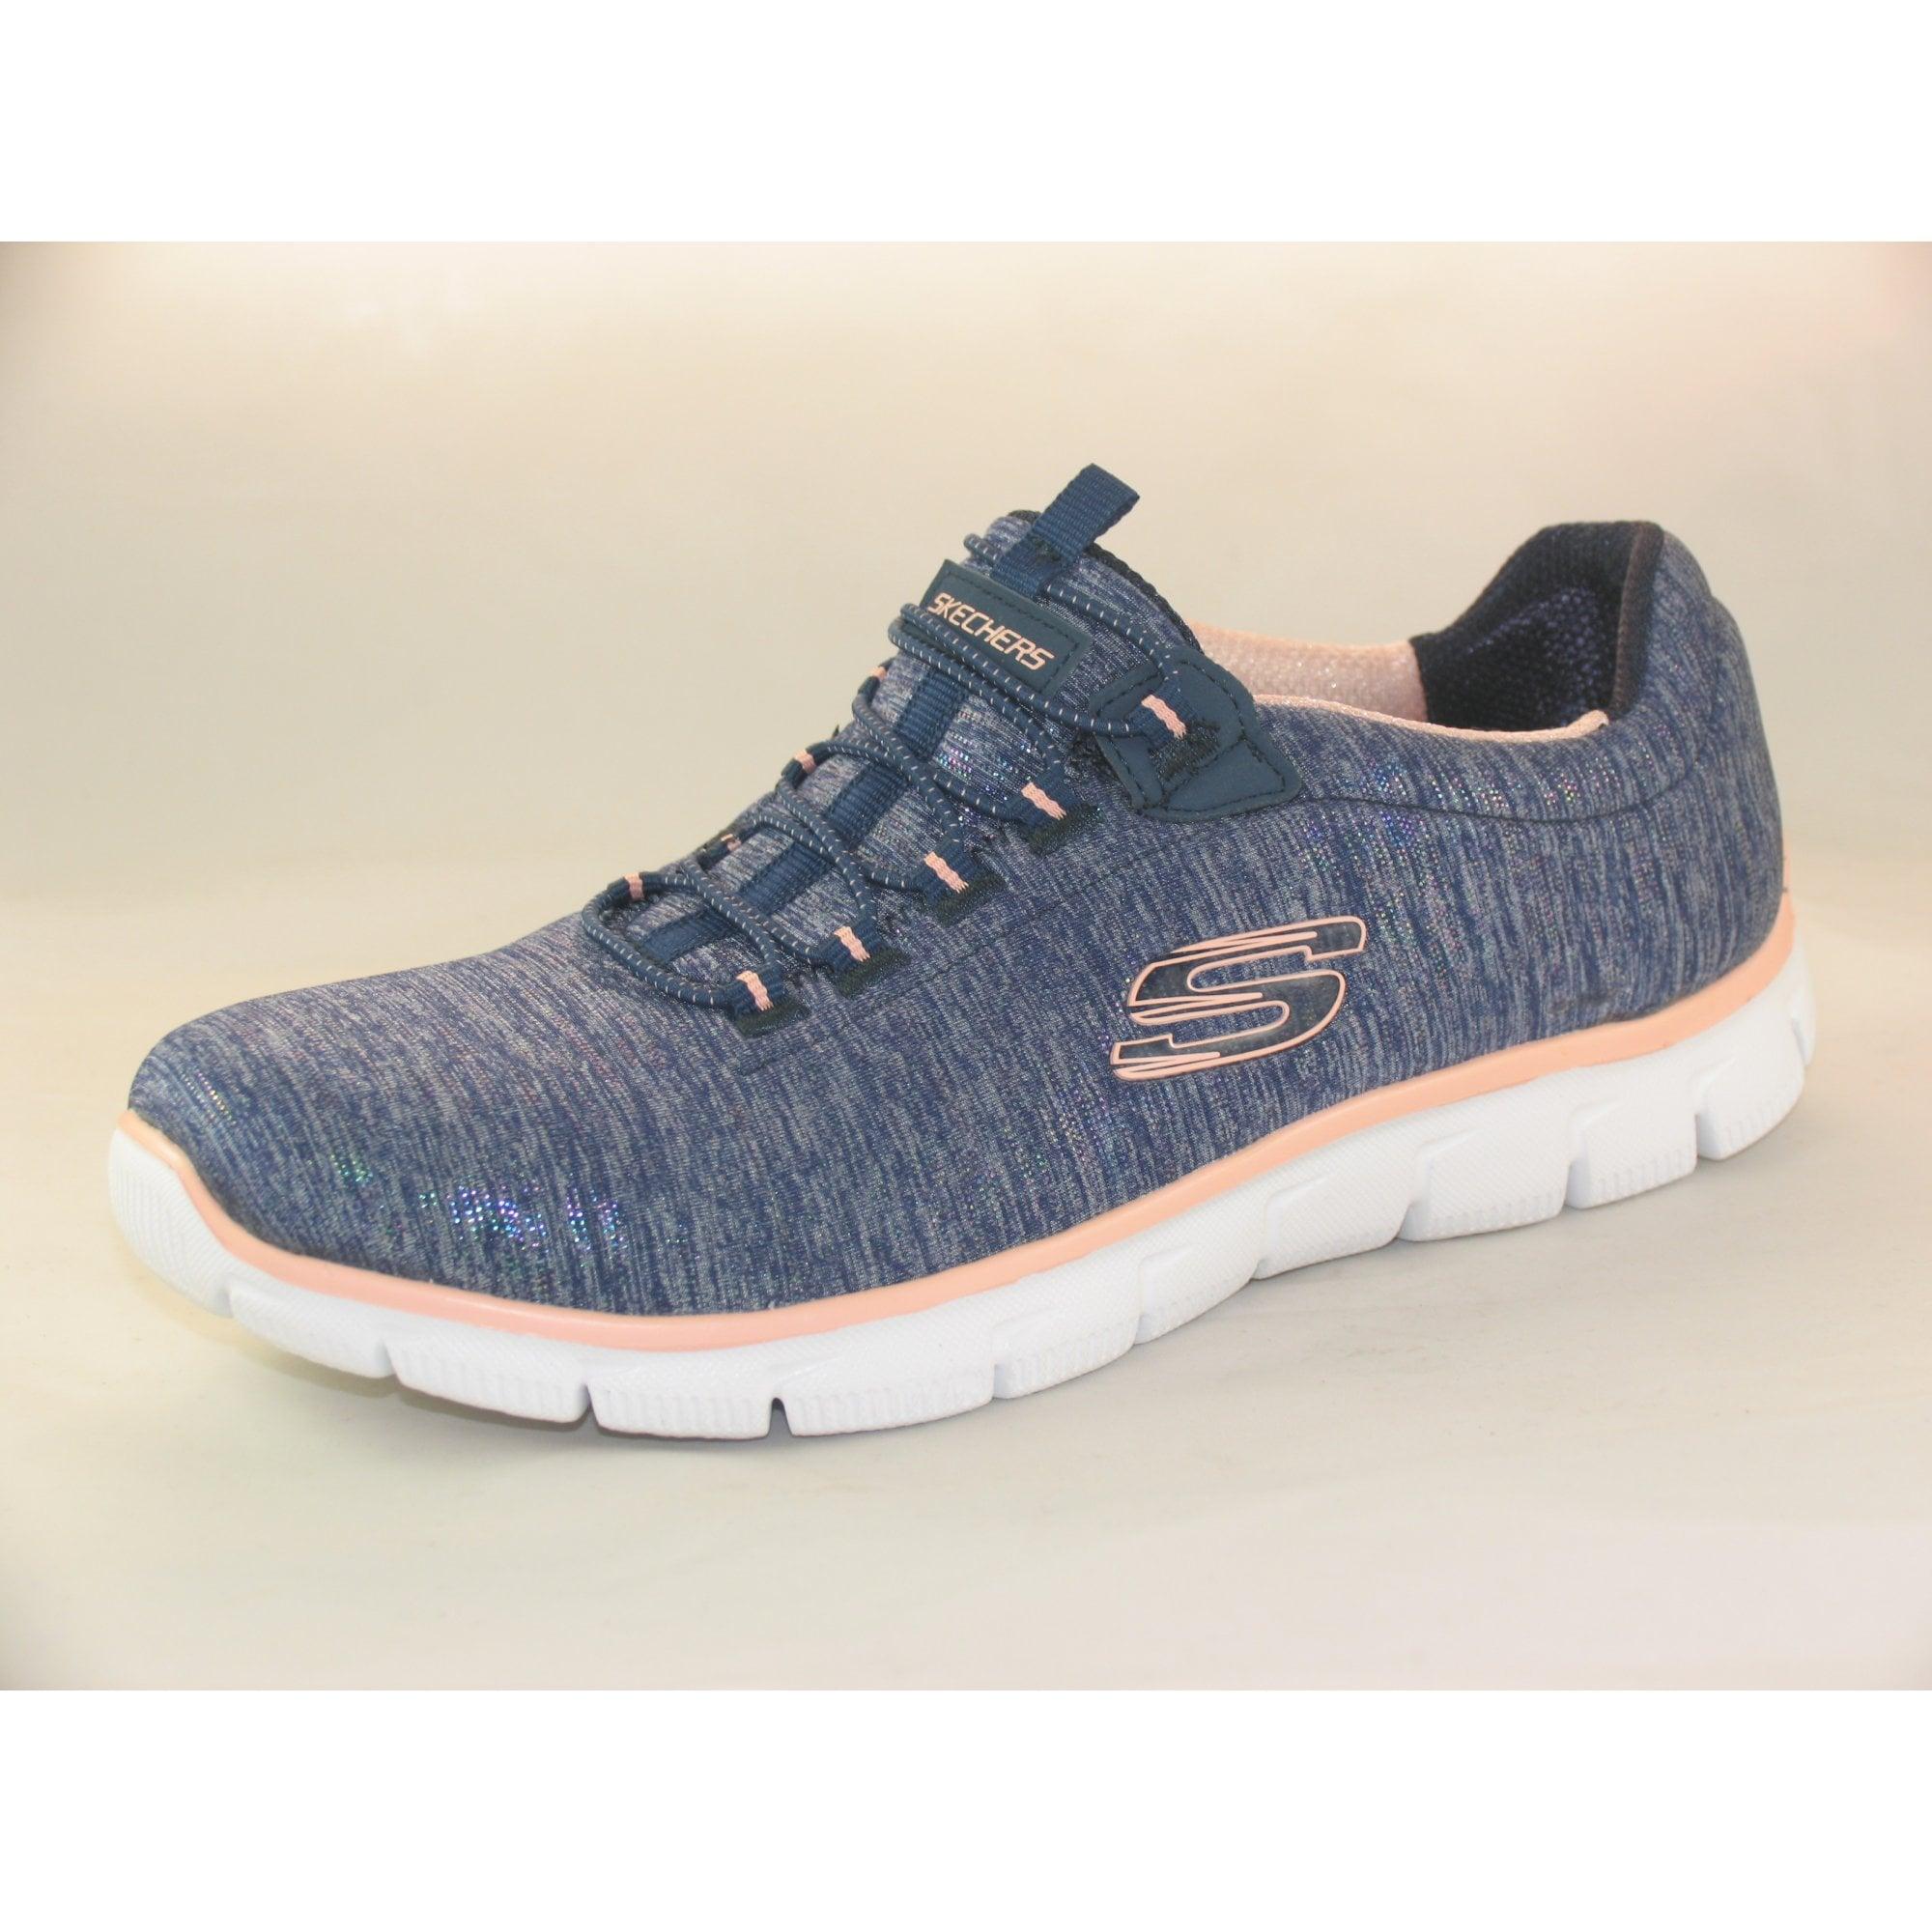 comunicación Sumergir Periodo perioperatorio  Buy Women's Skechers 12808 Trainers | Howorth's Shoes